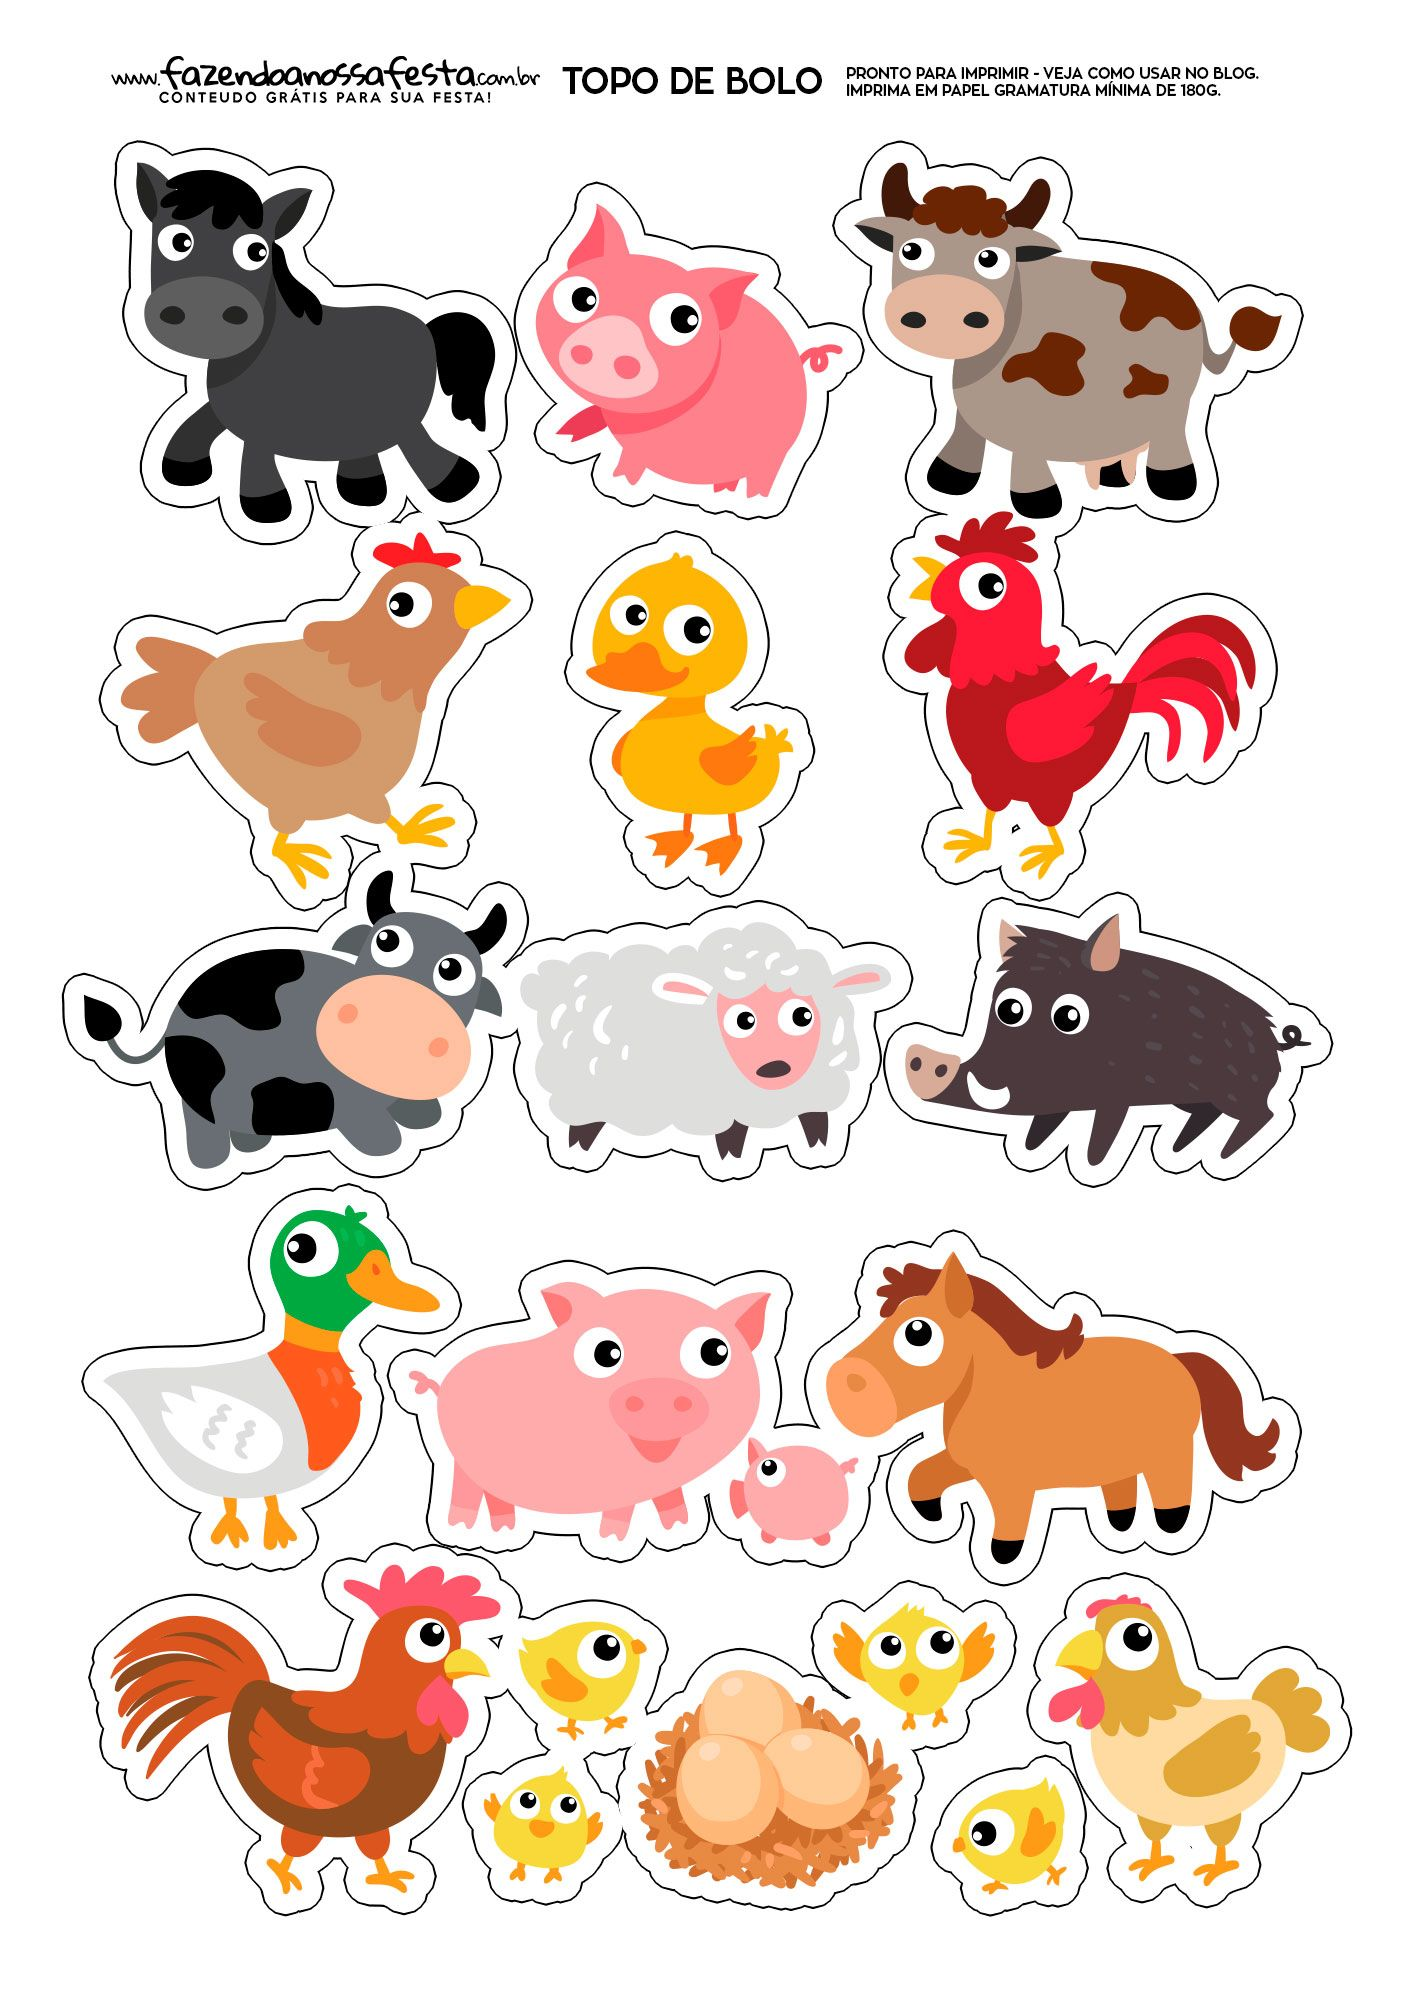 Topo De Bolo Fazendinha Animais Aniversario Da Fazenda